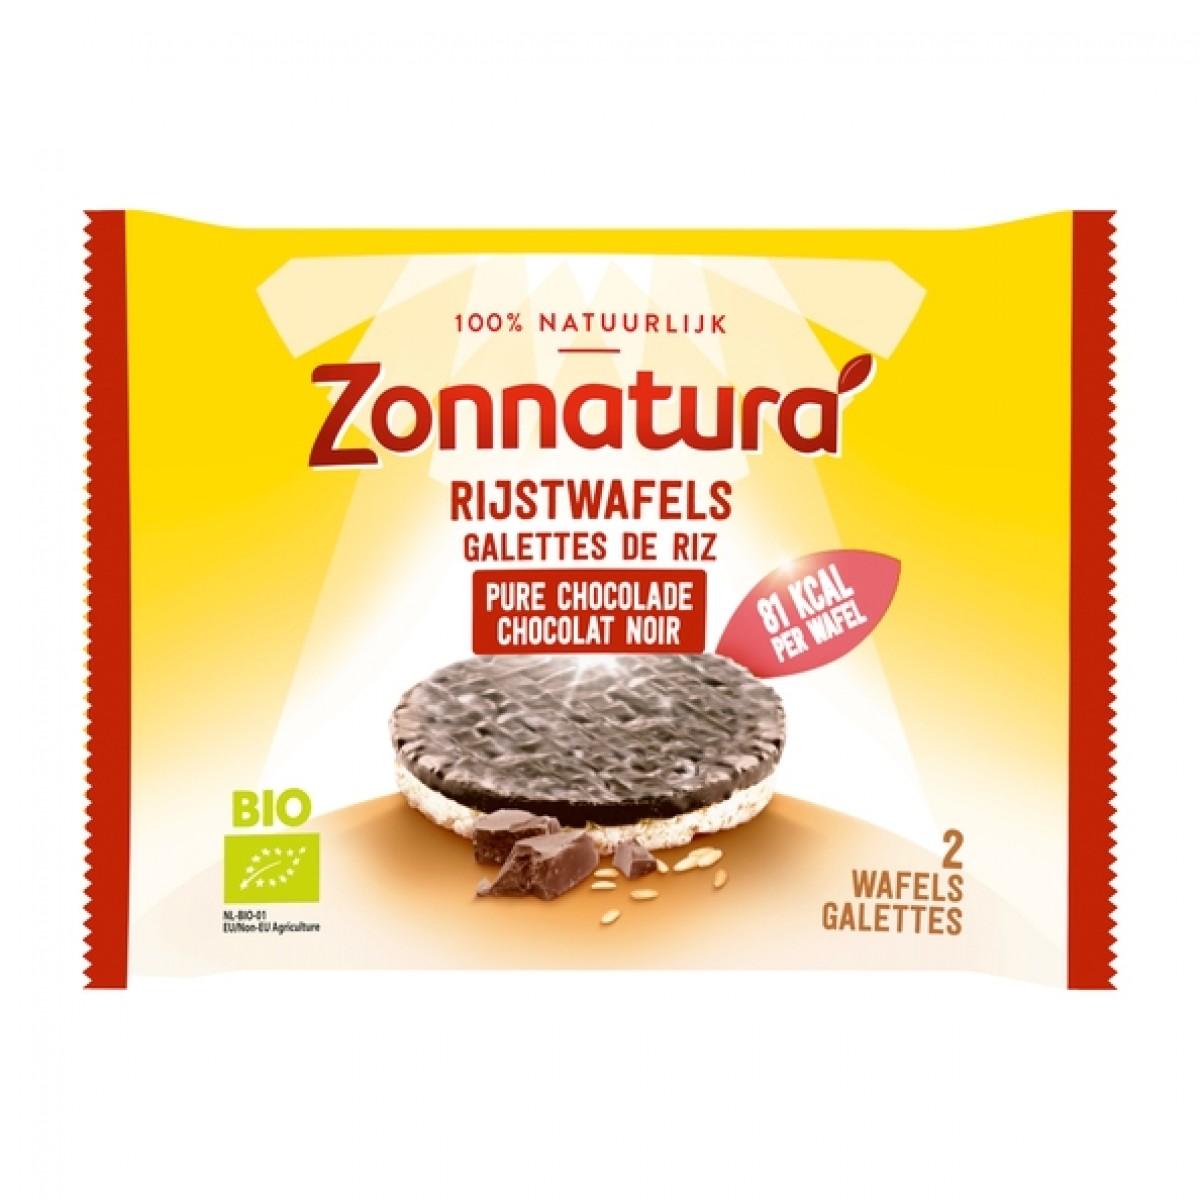 Rijstwafels Chocolade Puur Duo-pack